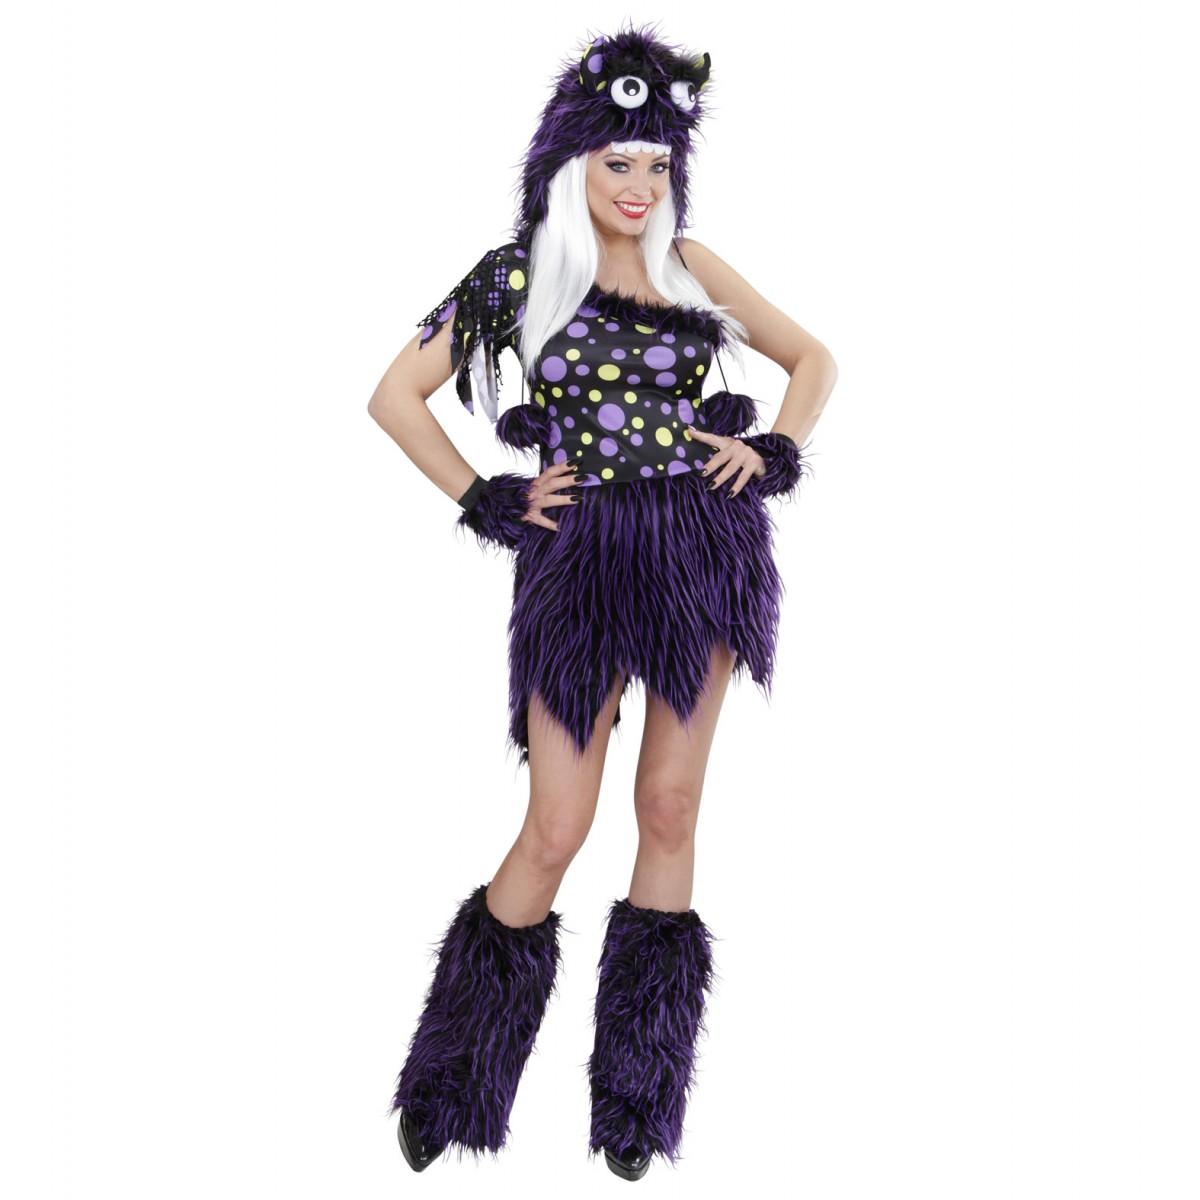 Costume lusso monster girl viola